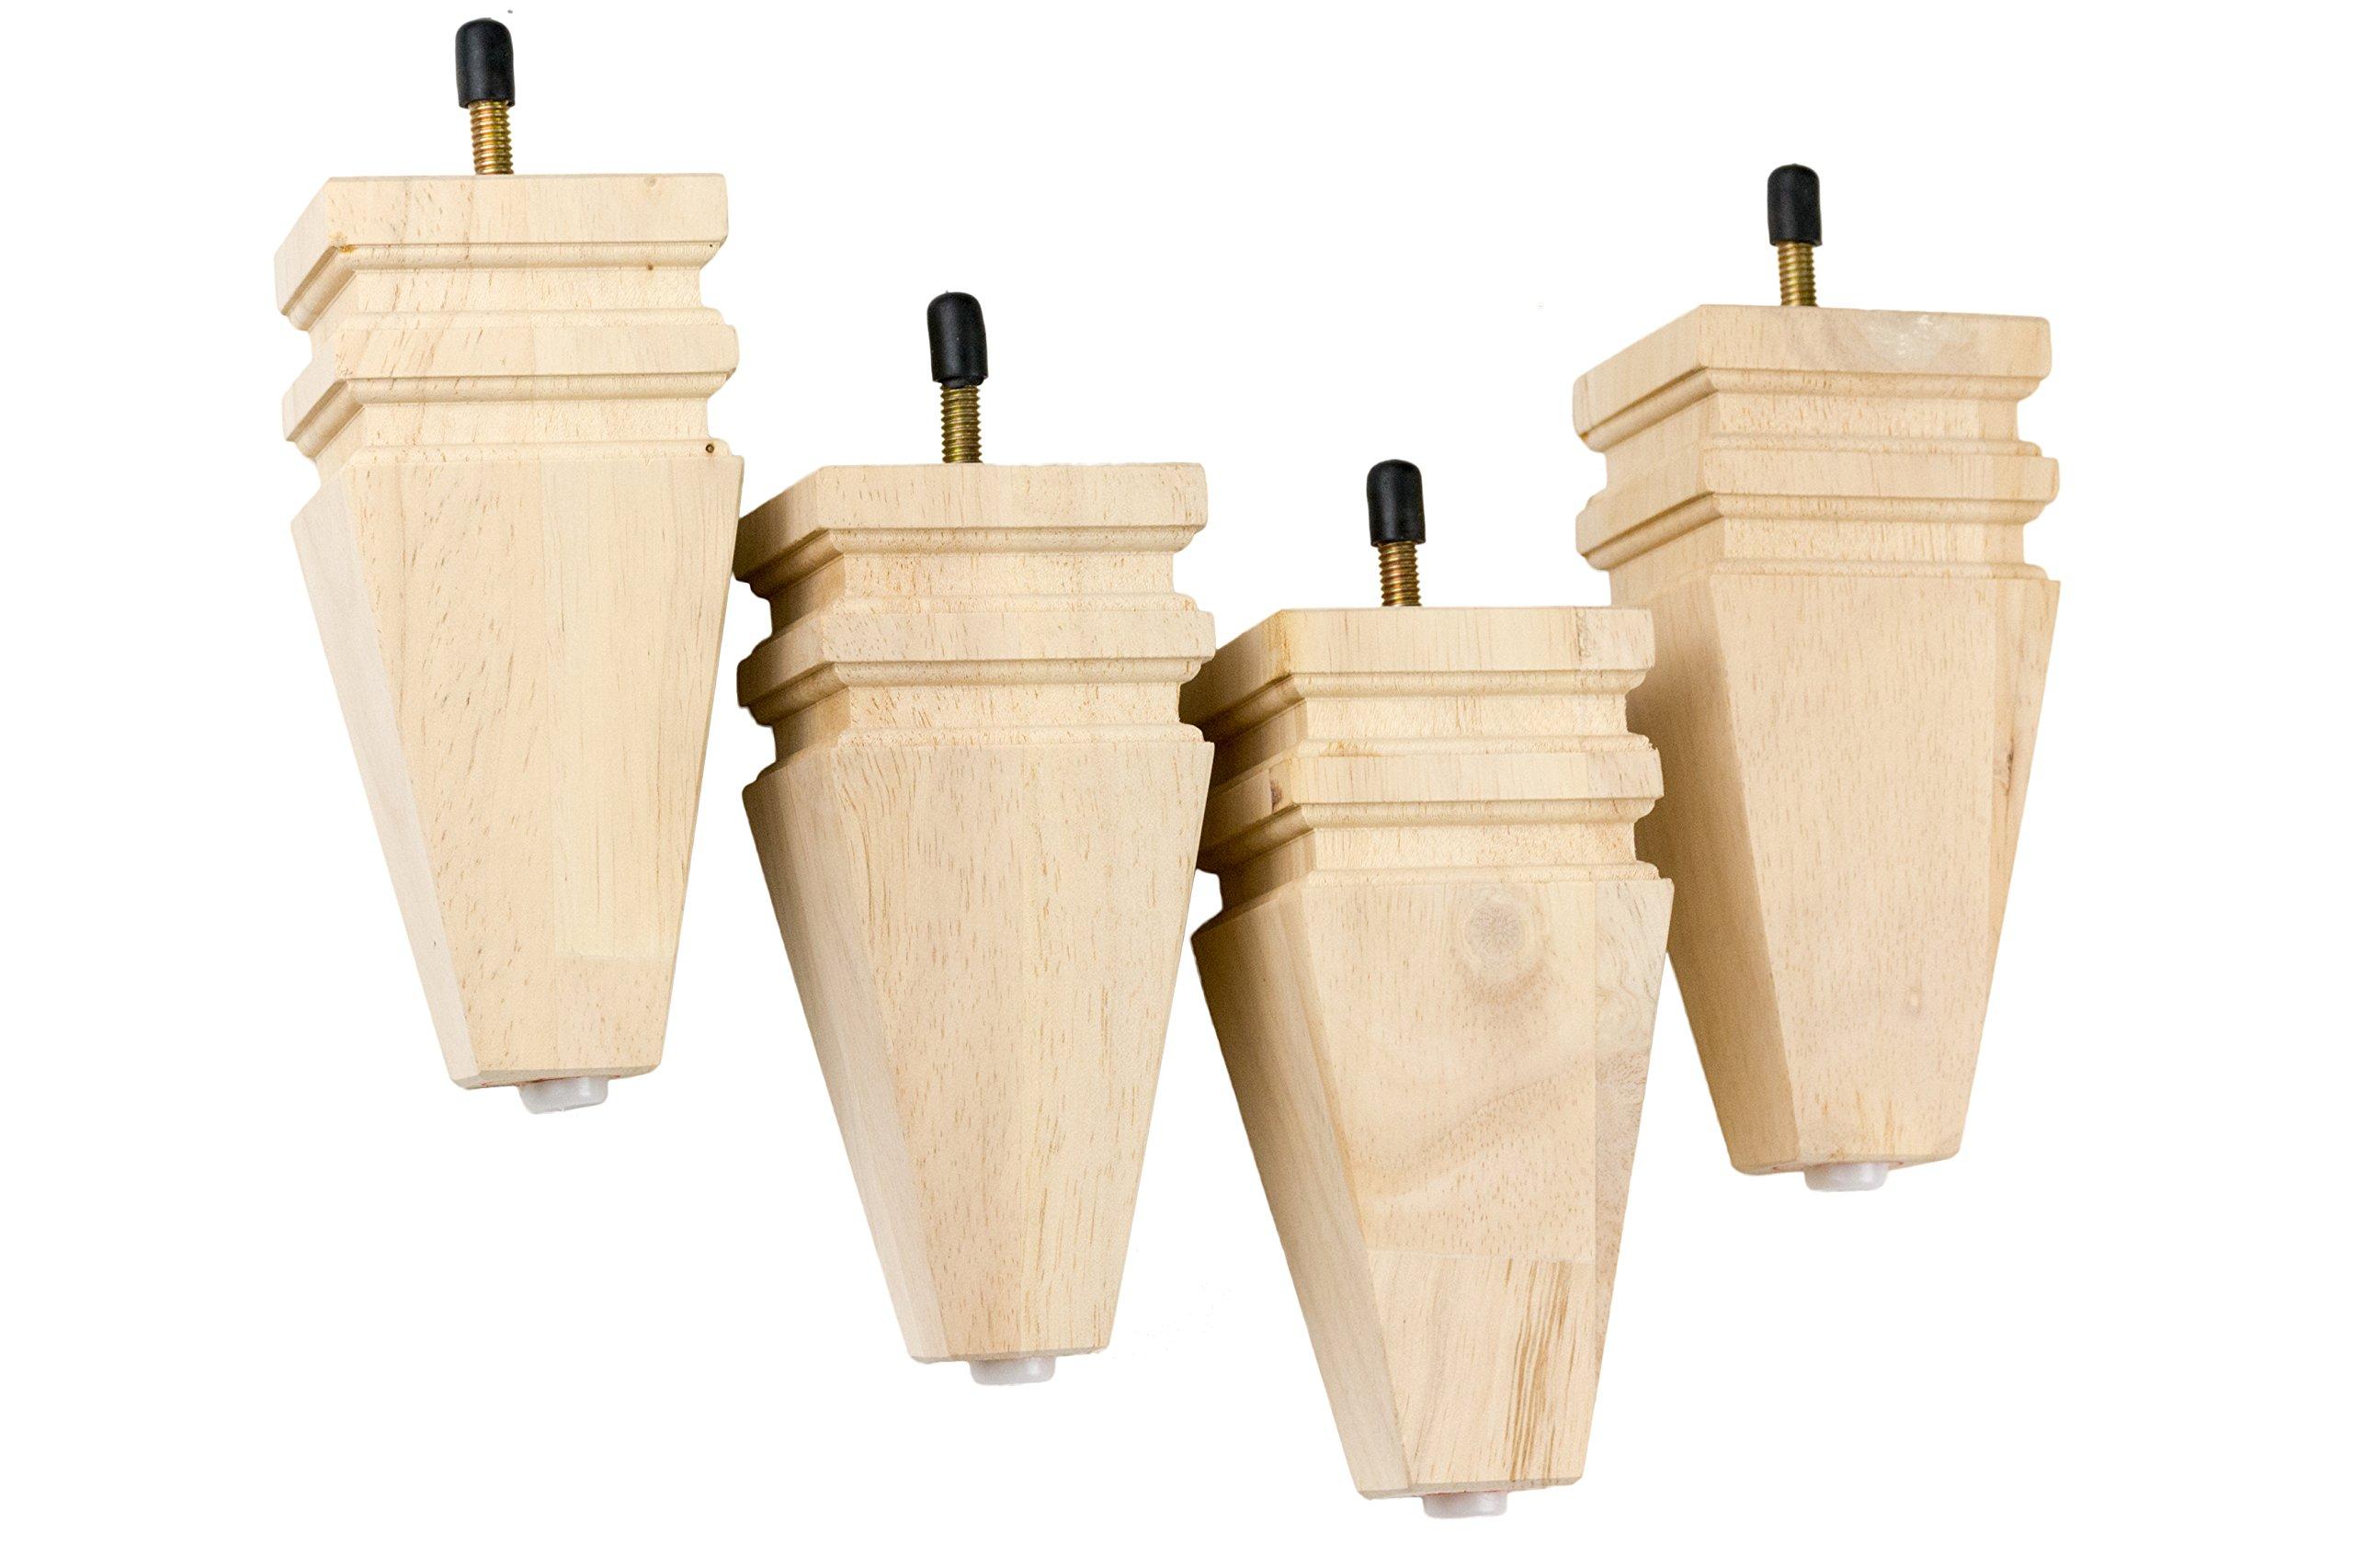 MJL Furniture Designs Medium Carved Block Wooden Replacement Sofa/Ottoman Furniture Square Threaded Leg (Set of 4), Nude, 6'' x 2-3/4'' x 1-1/8''